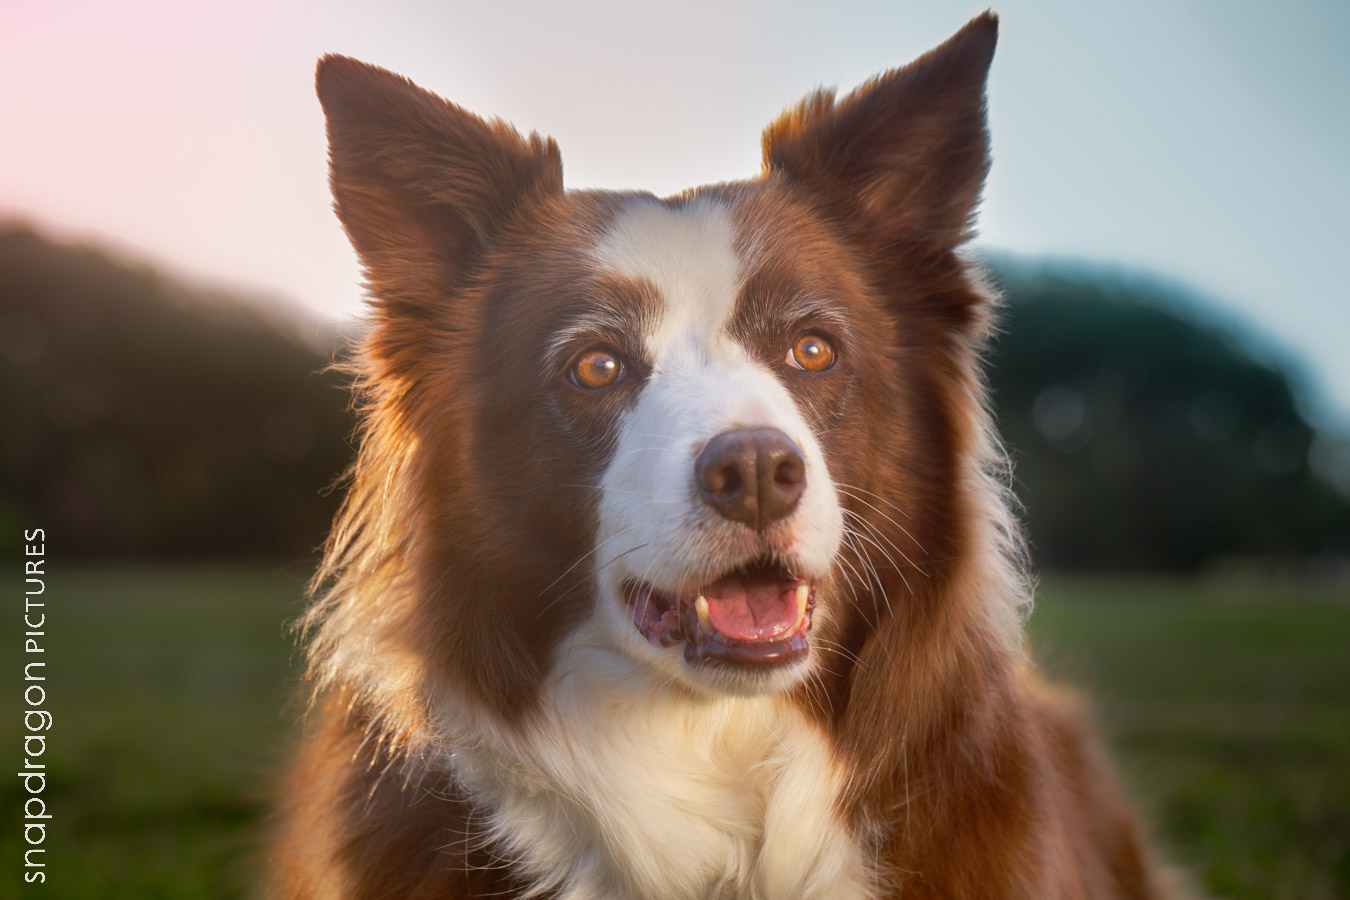 Canine, Couple, Dog, Dogs, Engagement, Family, Fine Art, Johannesburg, Leanne Russell Williams, Lifestyle, Pawtrait, Pawtraits, Pet, Pets, Photographer, Photographers, Photography, Portrait, Portraits, Snapdragon Pictures, South Africa